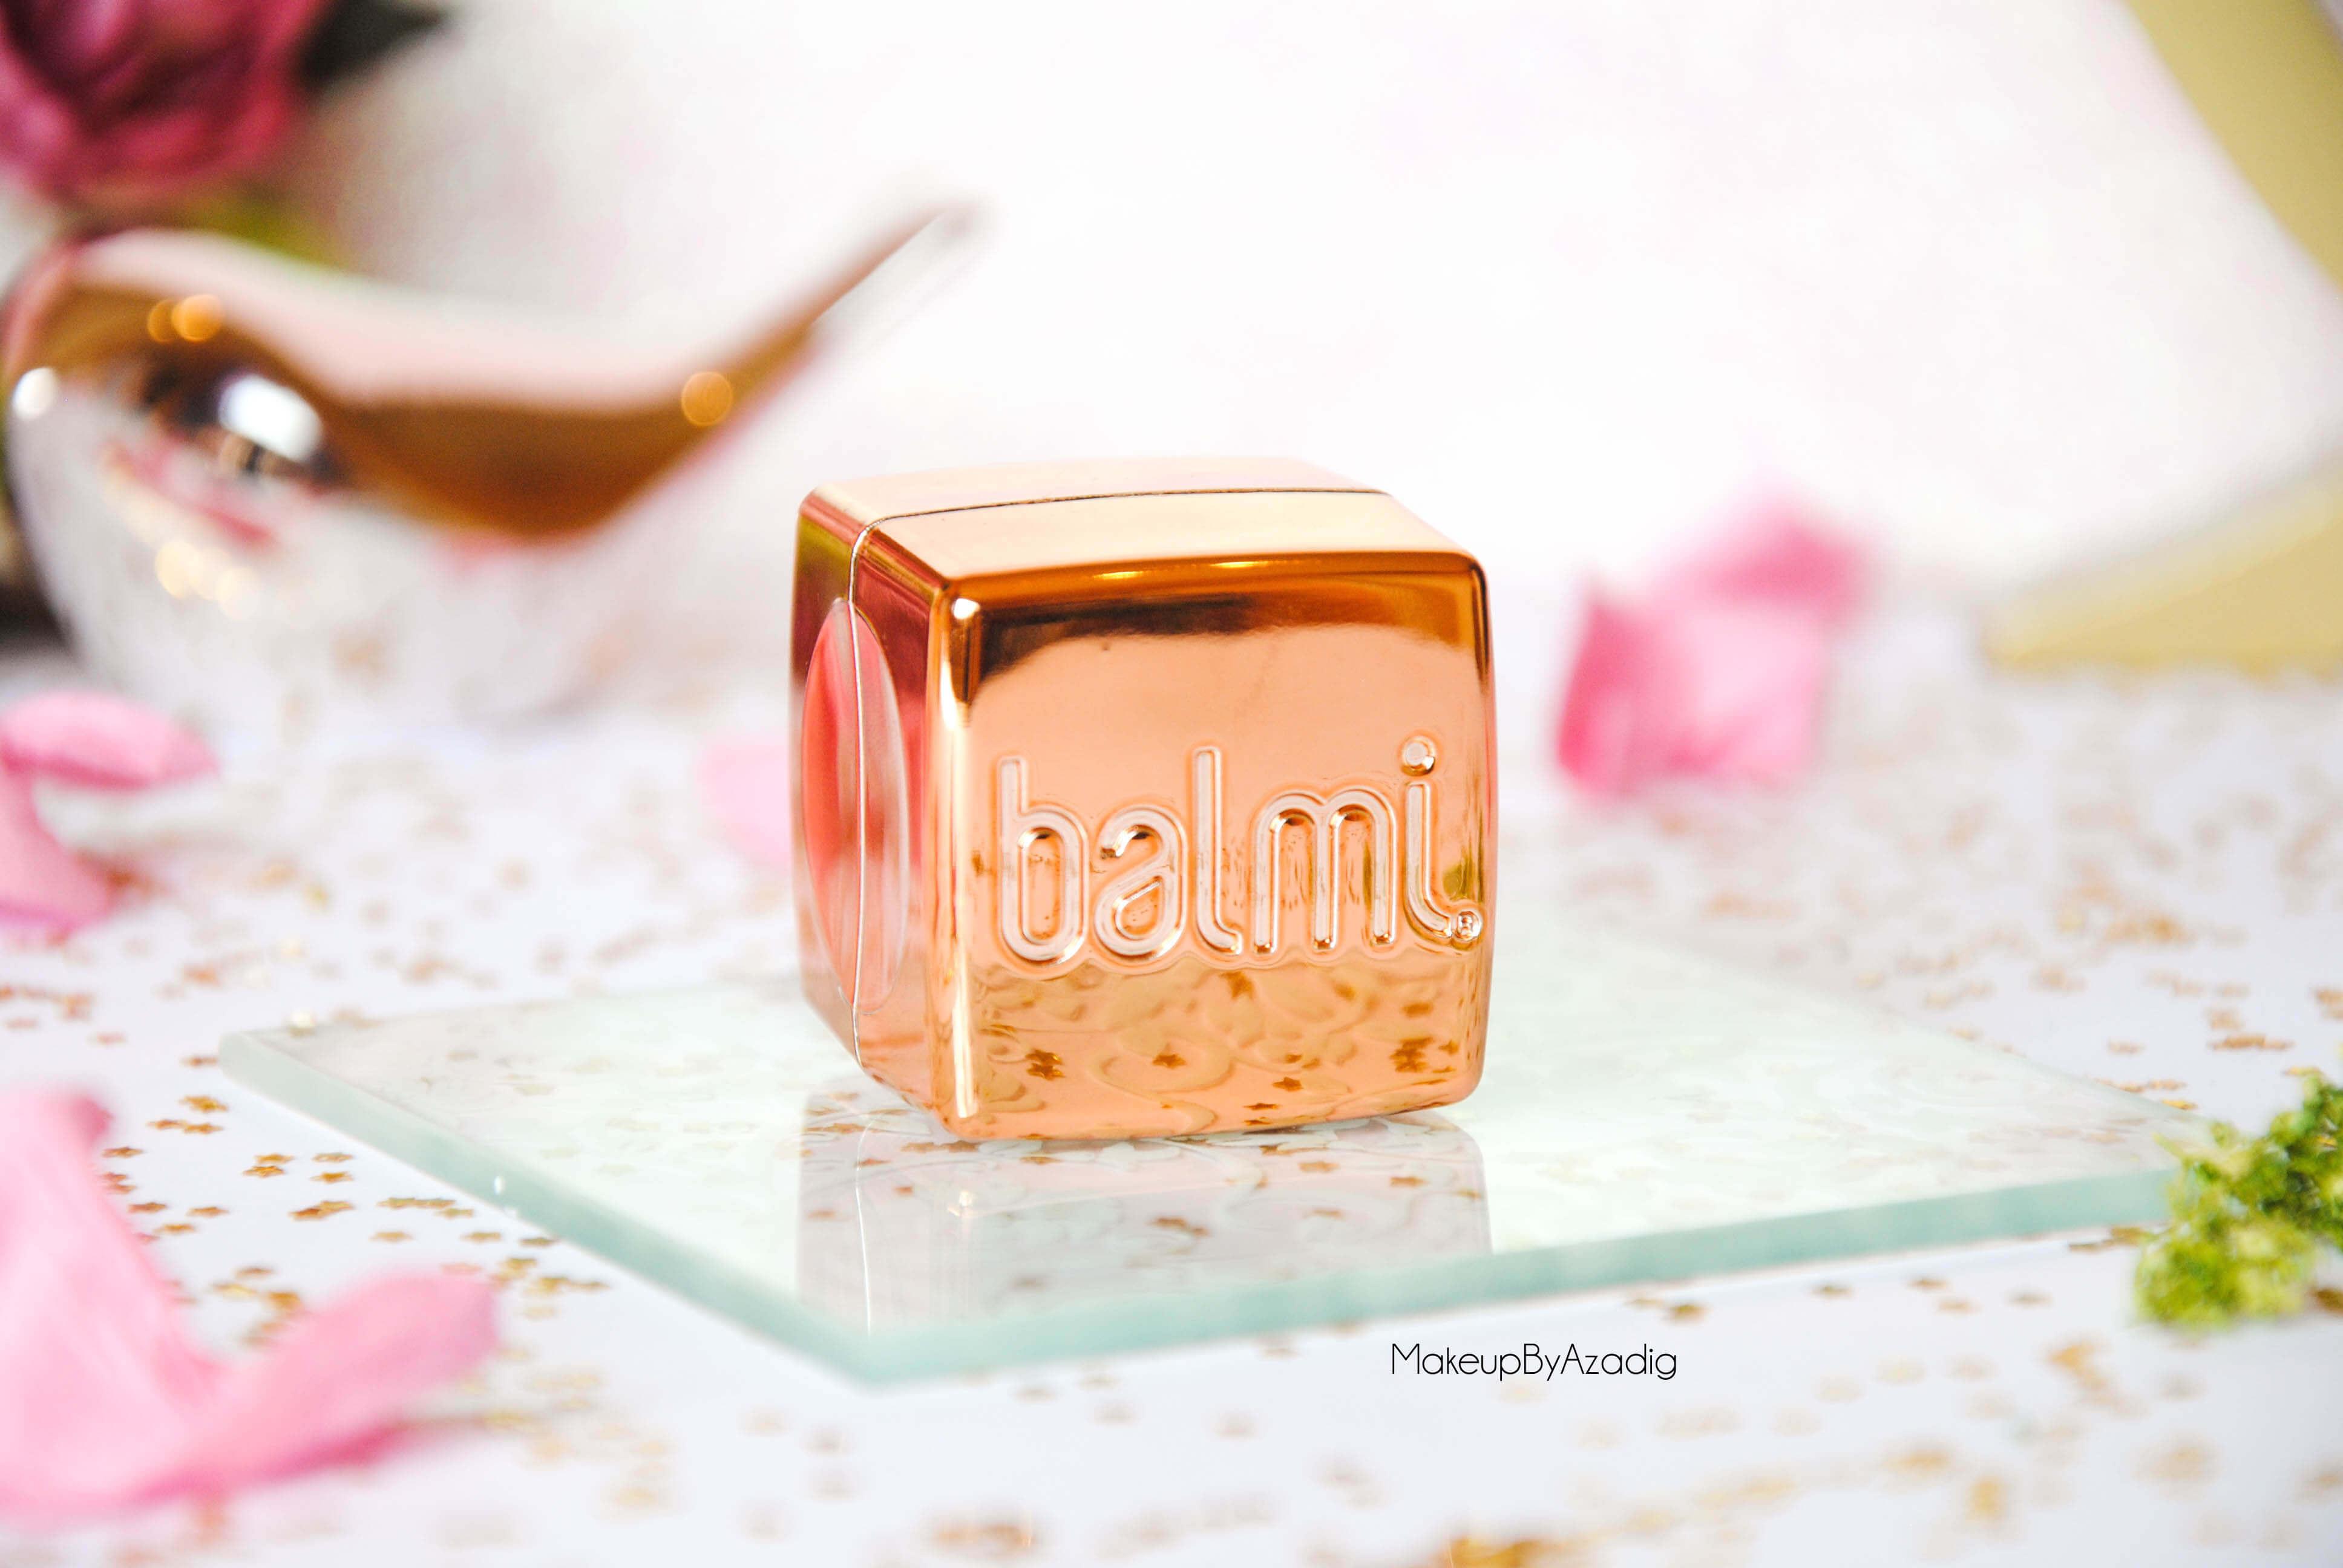 makeupbyazadig-baume-levres-balmi-roseberry-menthe-coco-fraise-beaute-privee-revue-review-troyes-dijon-flop